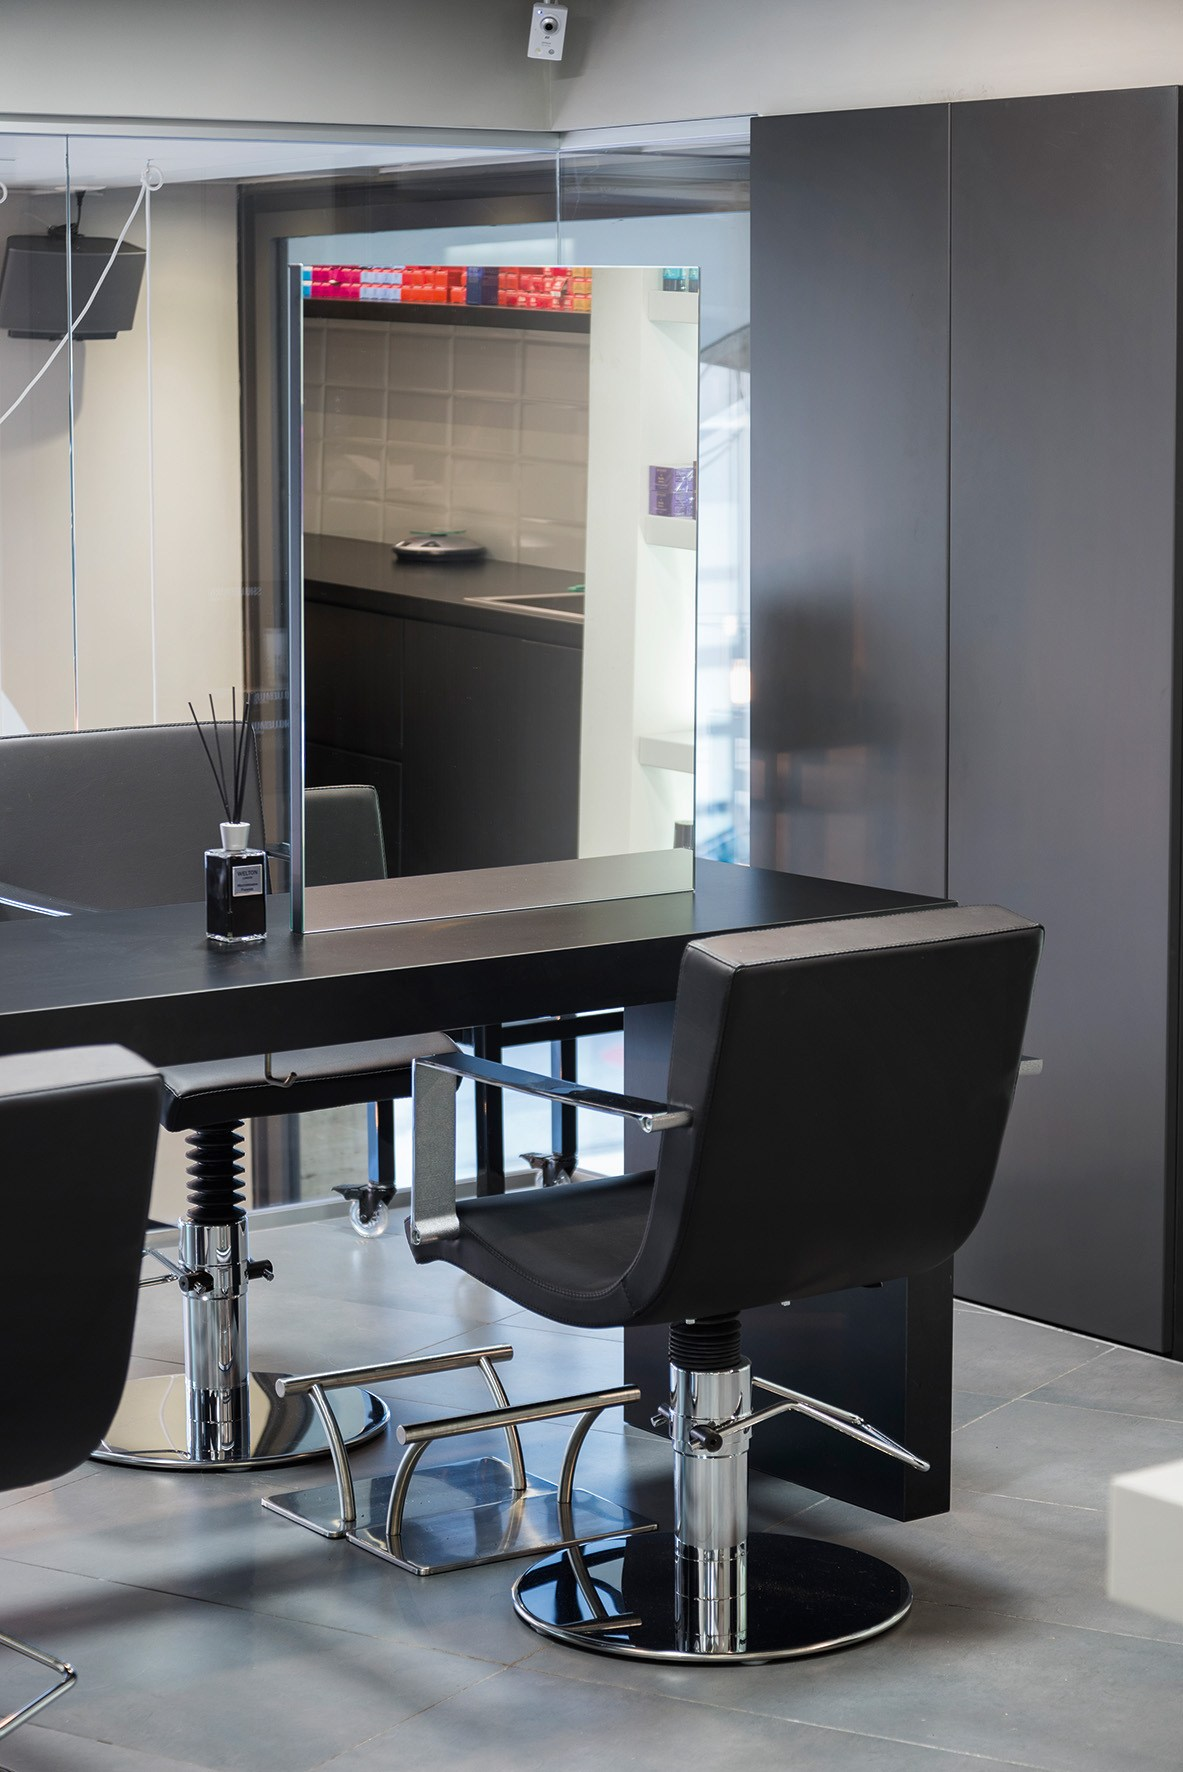 Tm Italia Cucine : Arredo per saloni di bellezza by tm italia cucine